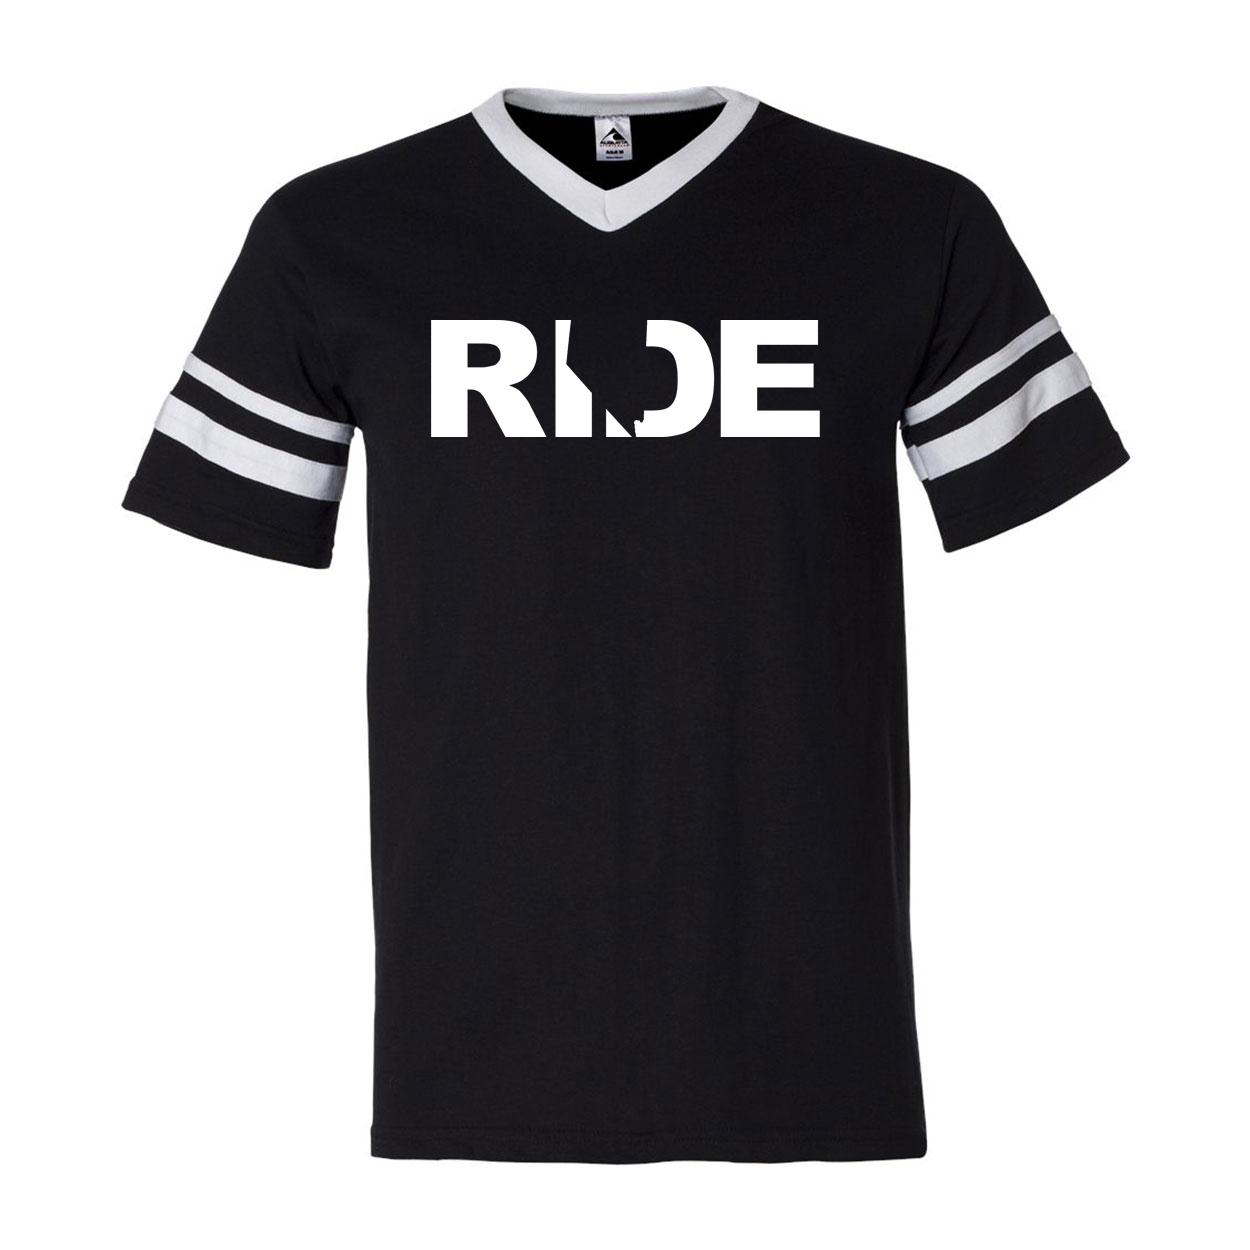 Ride Nevada Classic Premium Striped Jersey T-Shirt Black/White (White Logo)